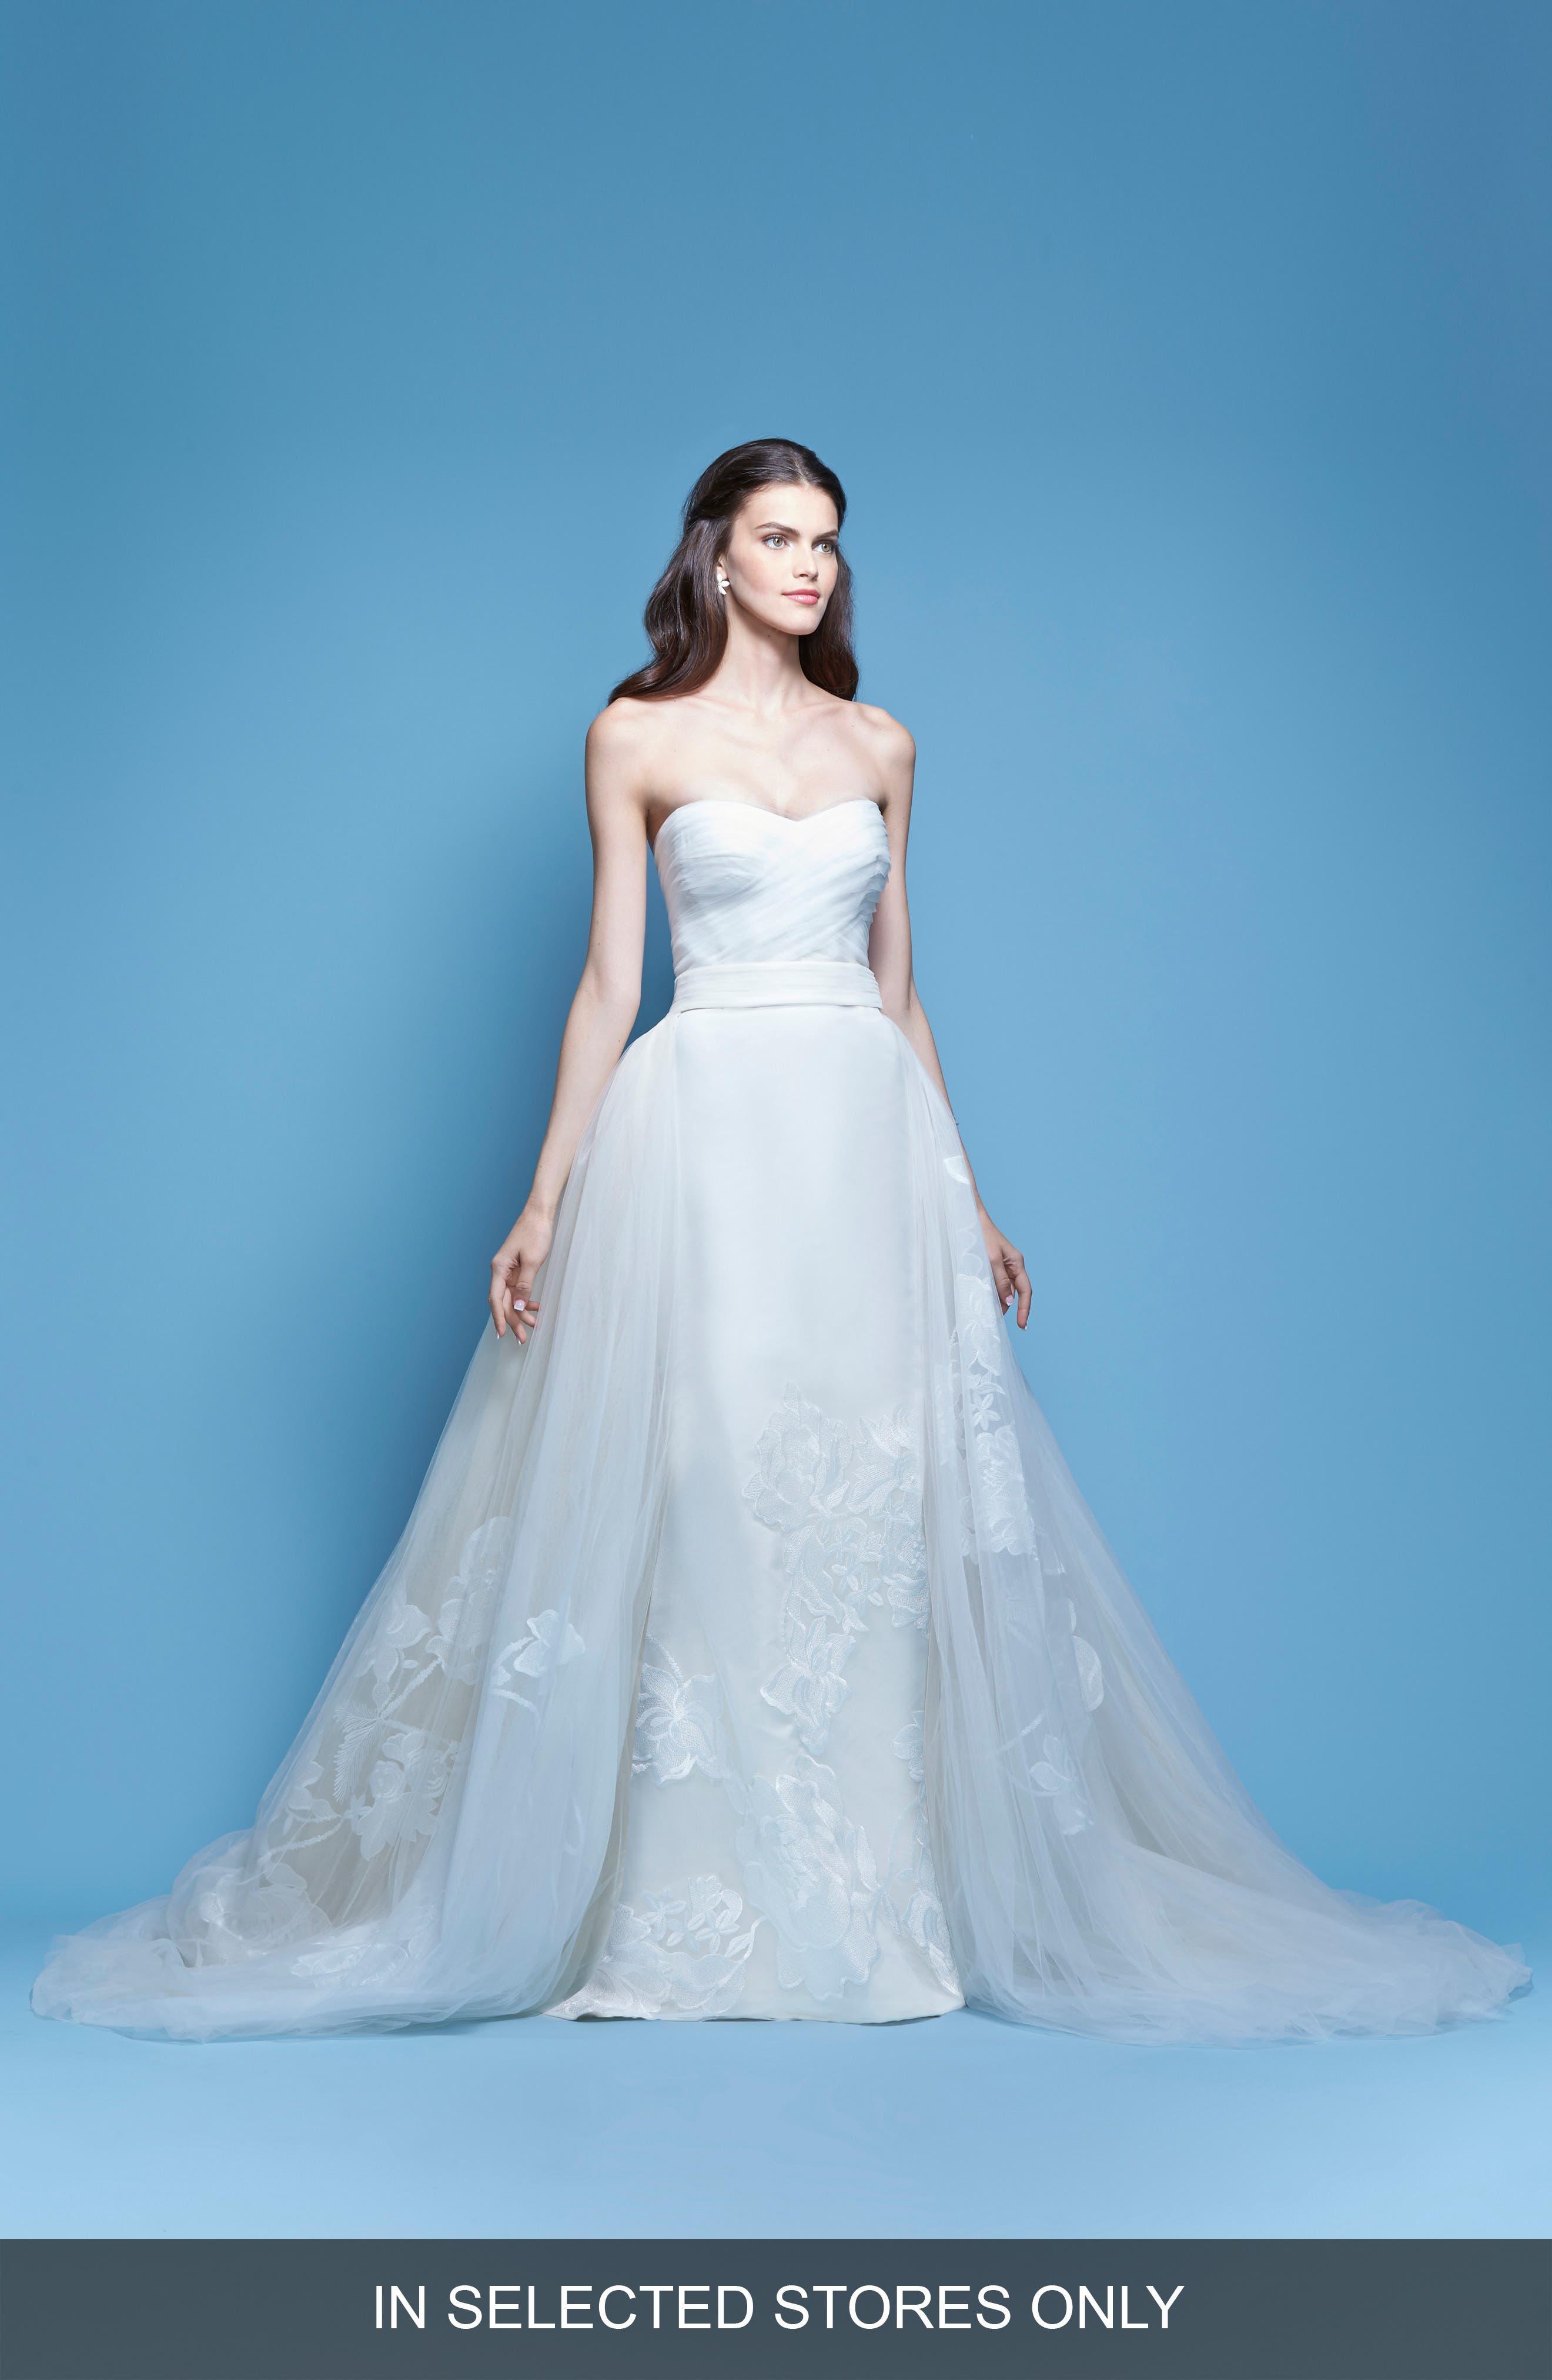 Beautiful Wedding Dresses Department Stores – Wedding